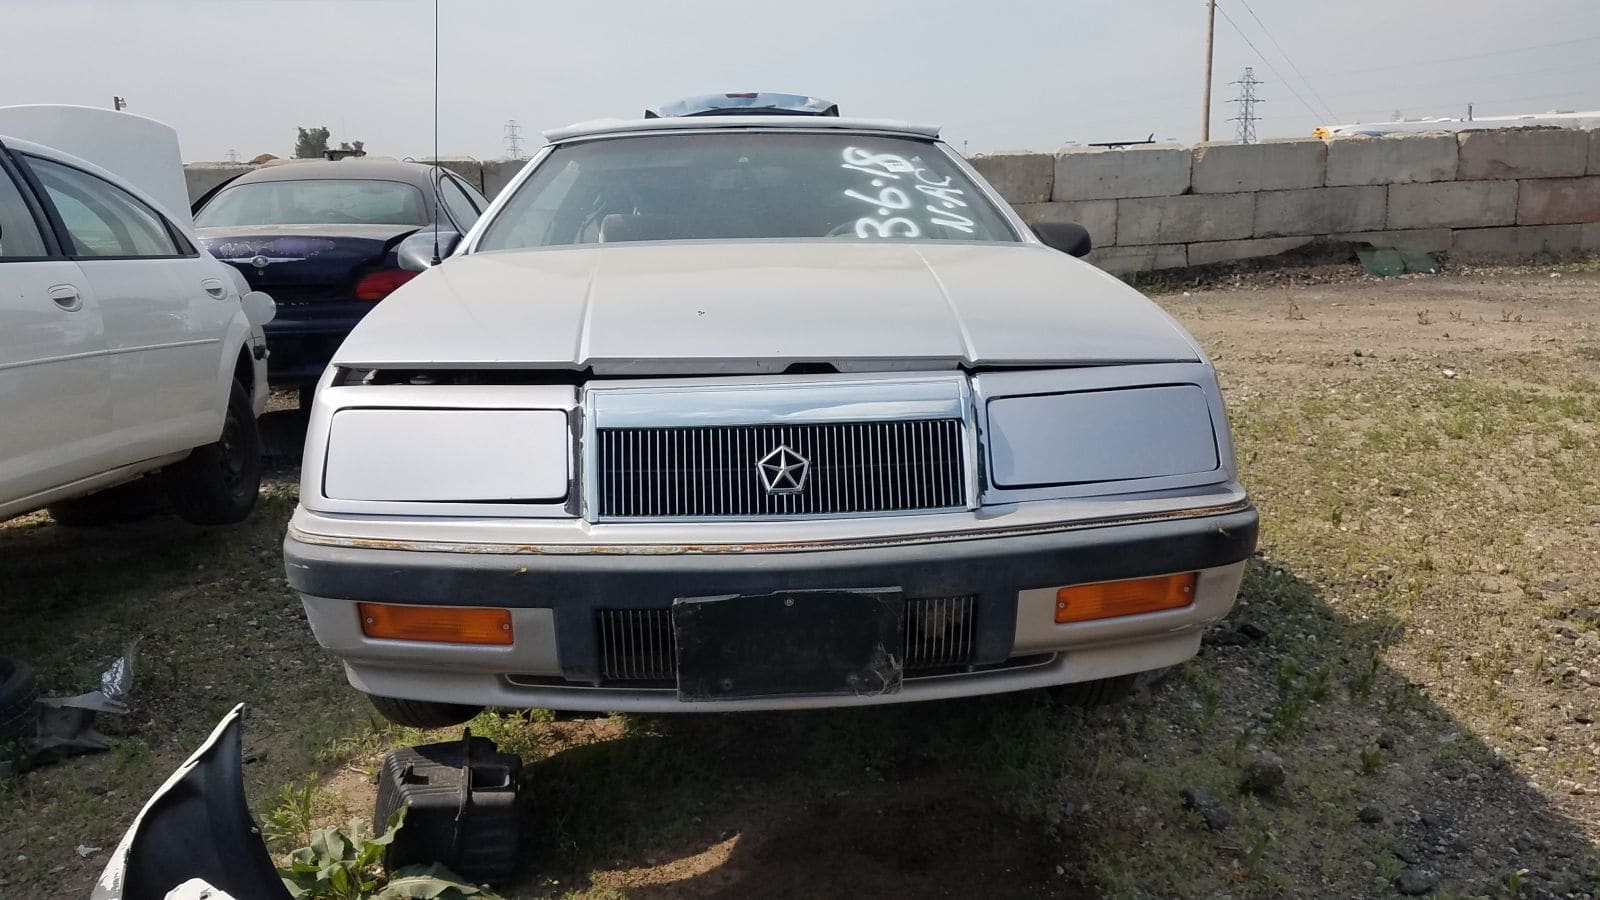 Junked 1991 Chrysler Lebaron Convertible